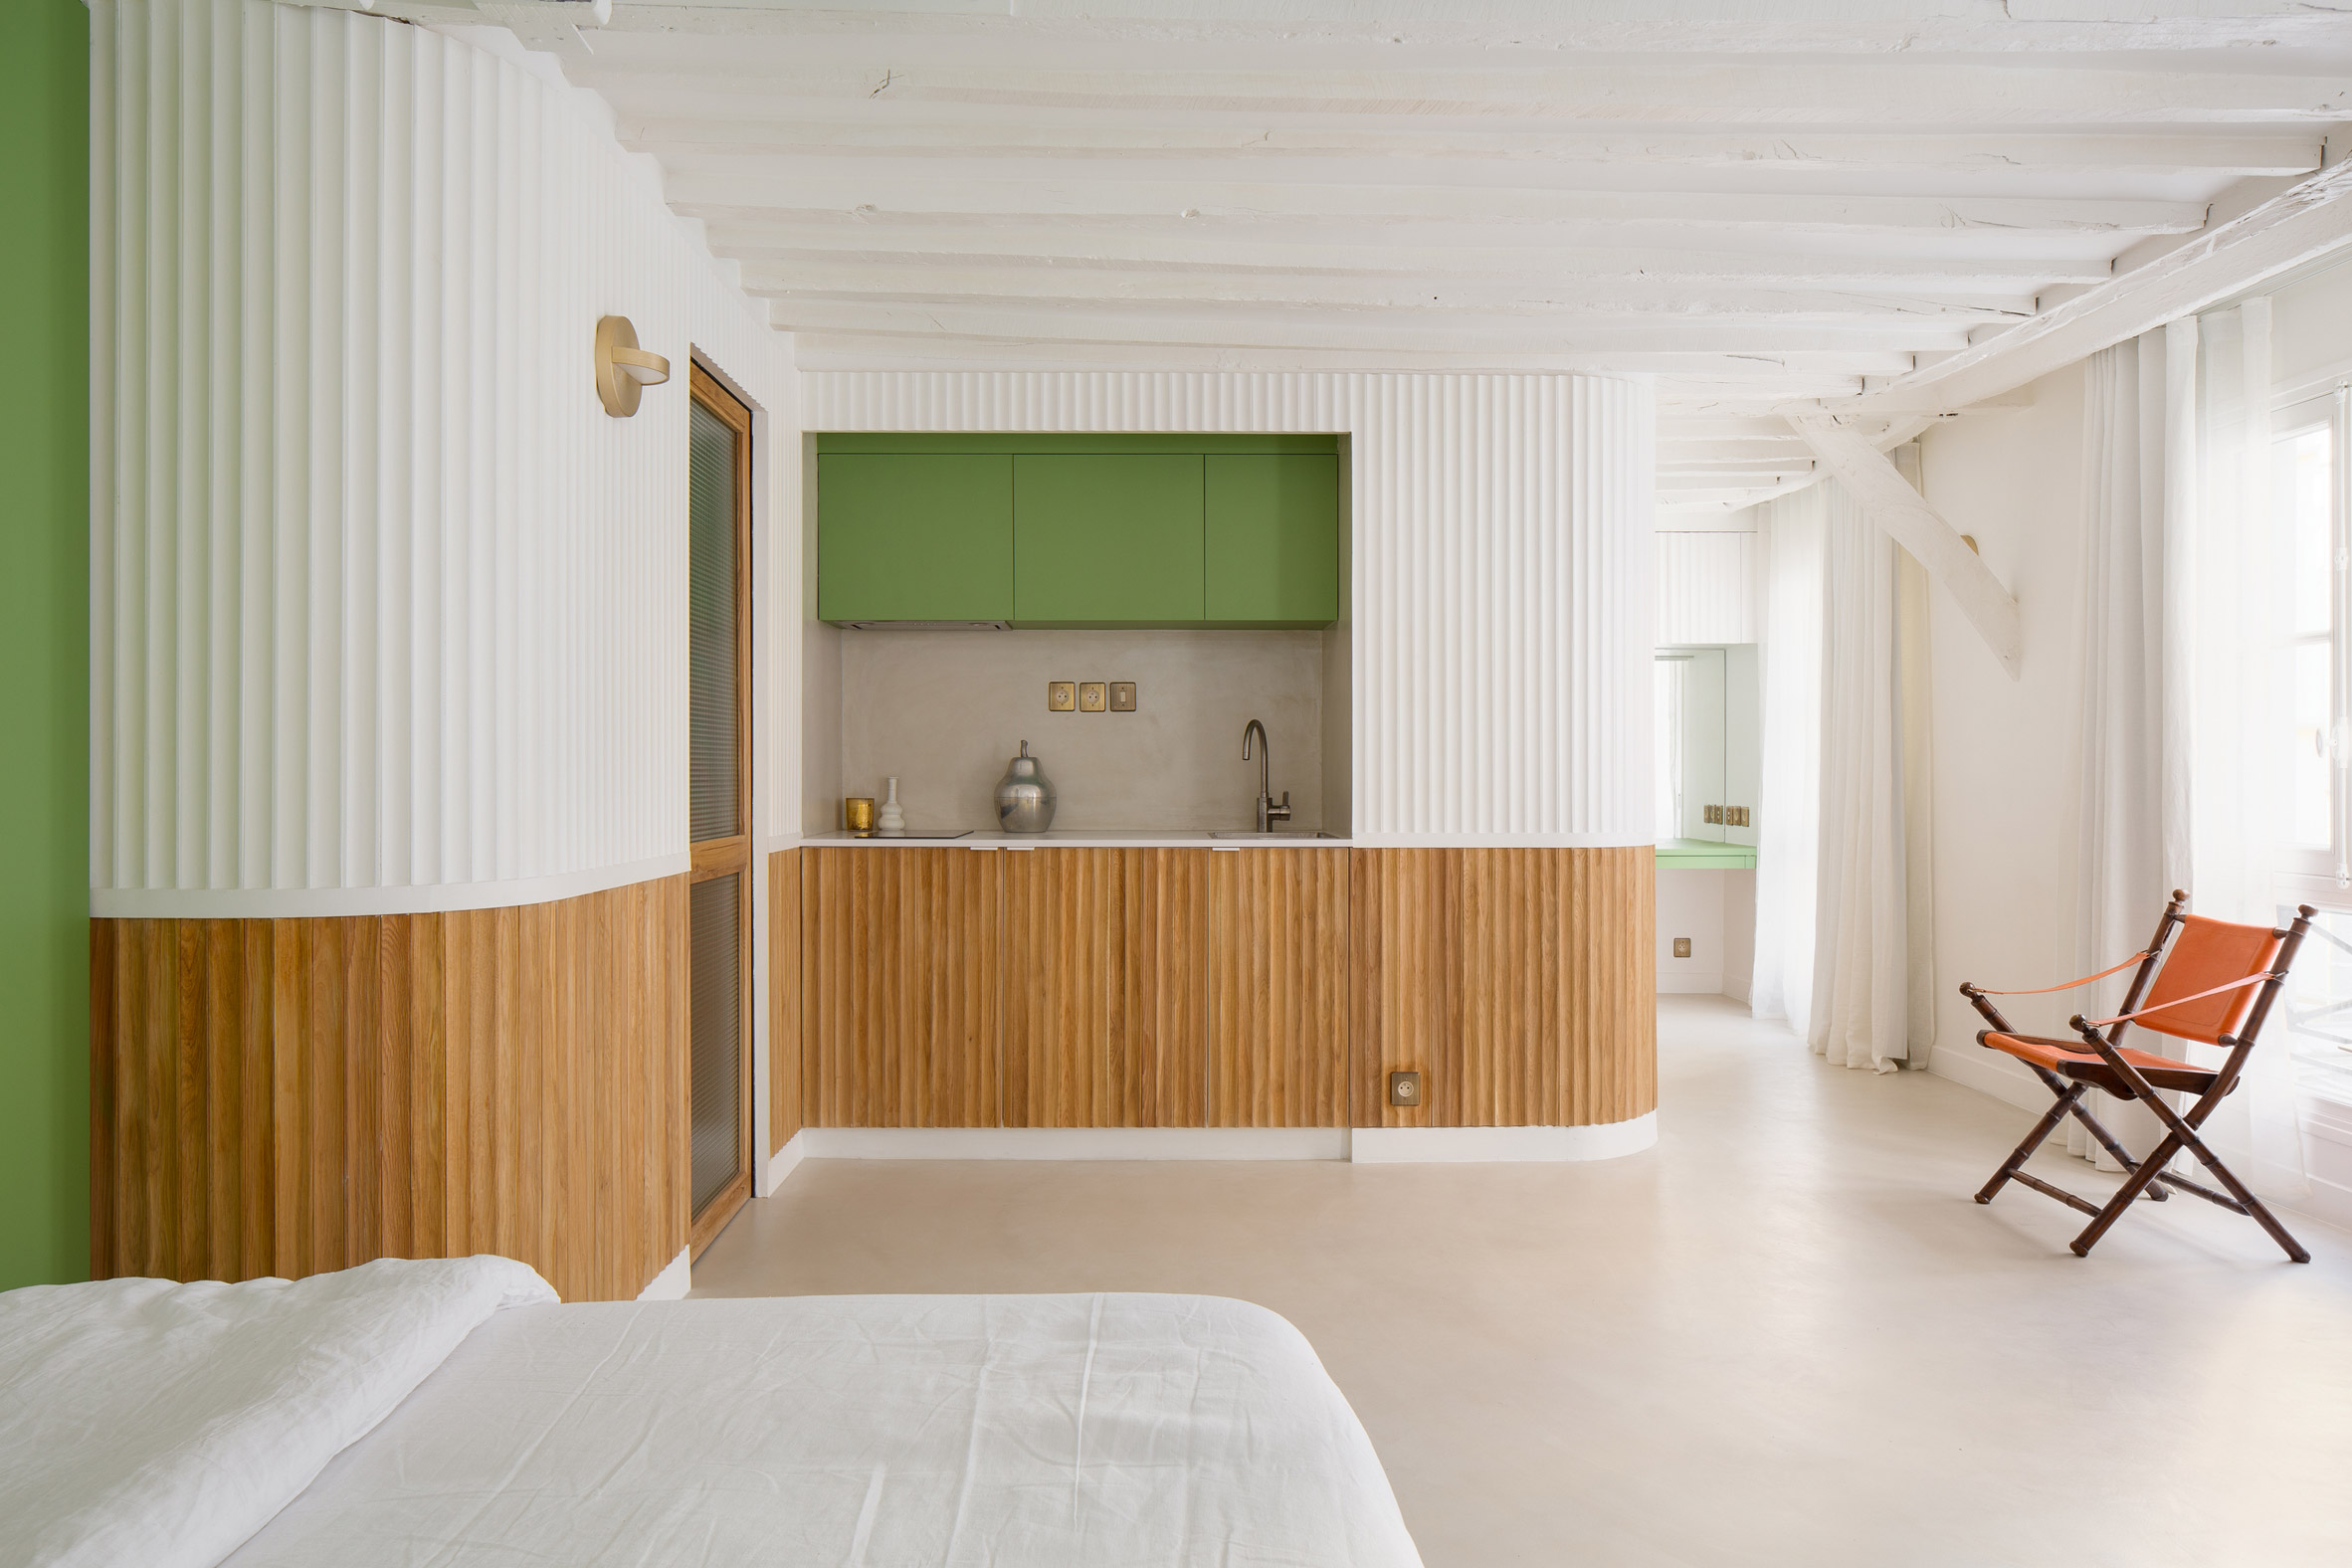 It has a kitchenette built into the partition wall by Pierre-Louis Gerlier Architecte